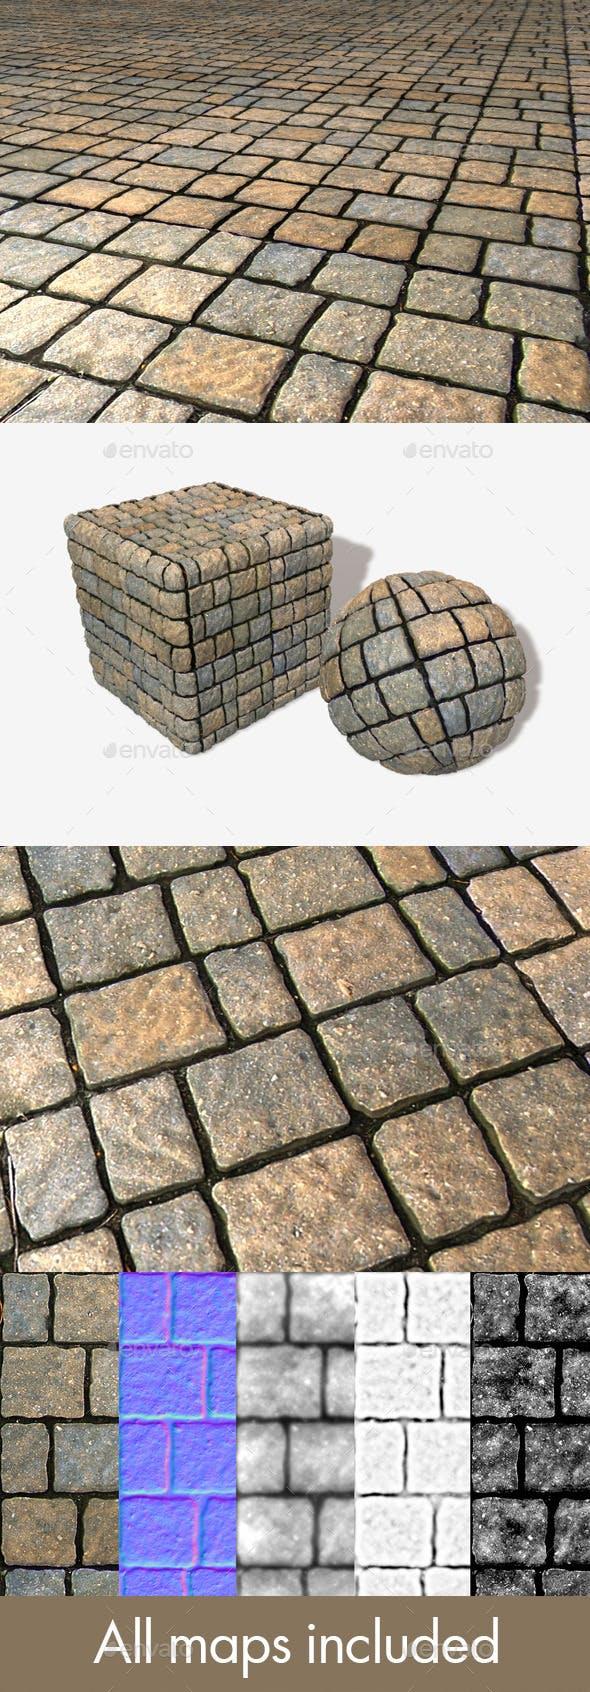 Floor Bricks Seamless Texture - 3DOcean Item for Sale